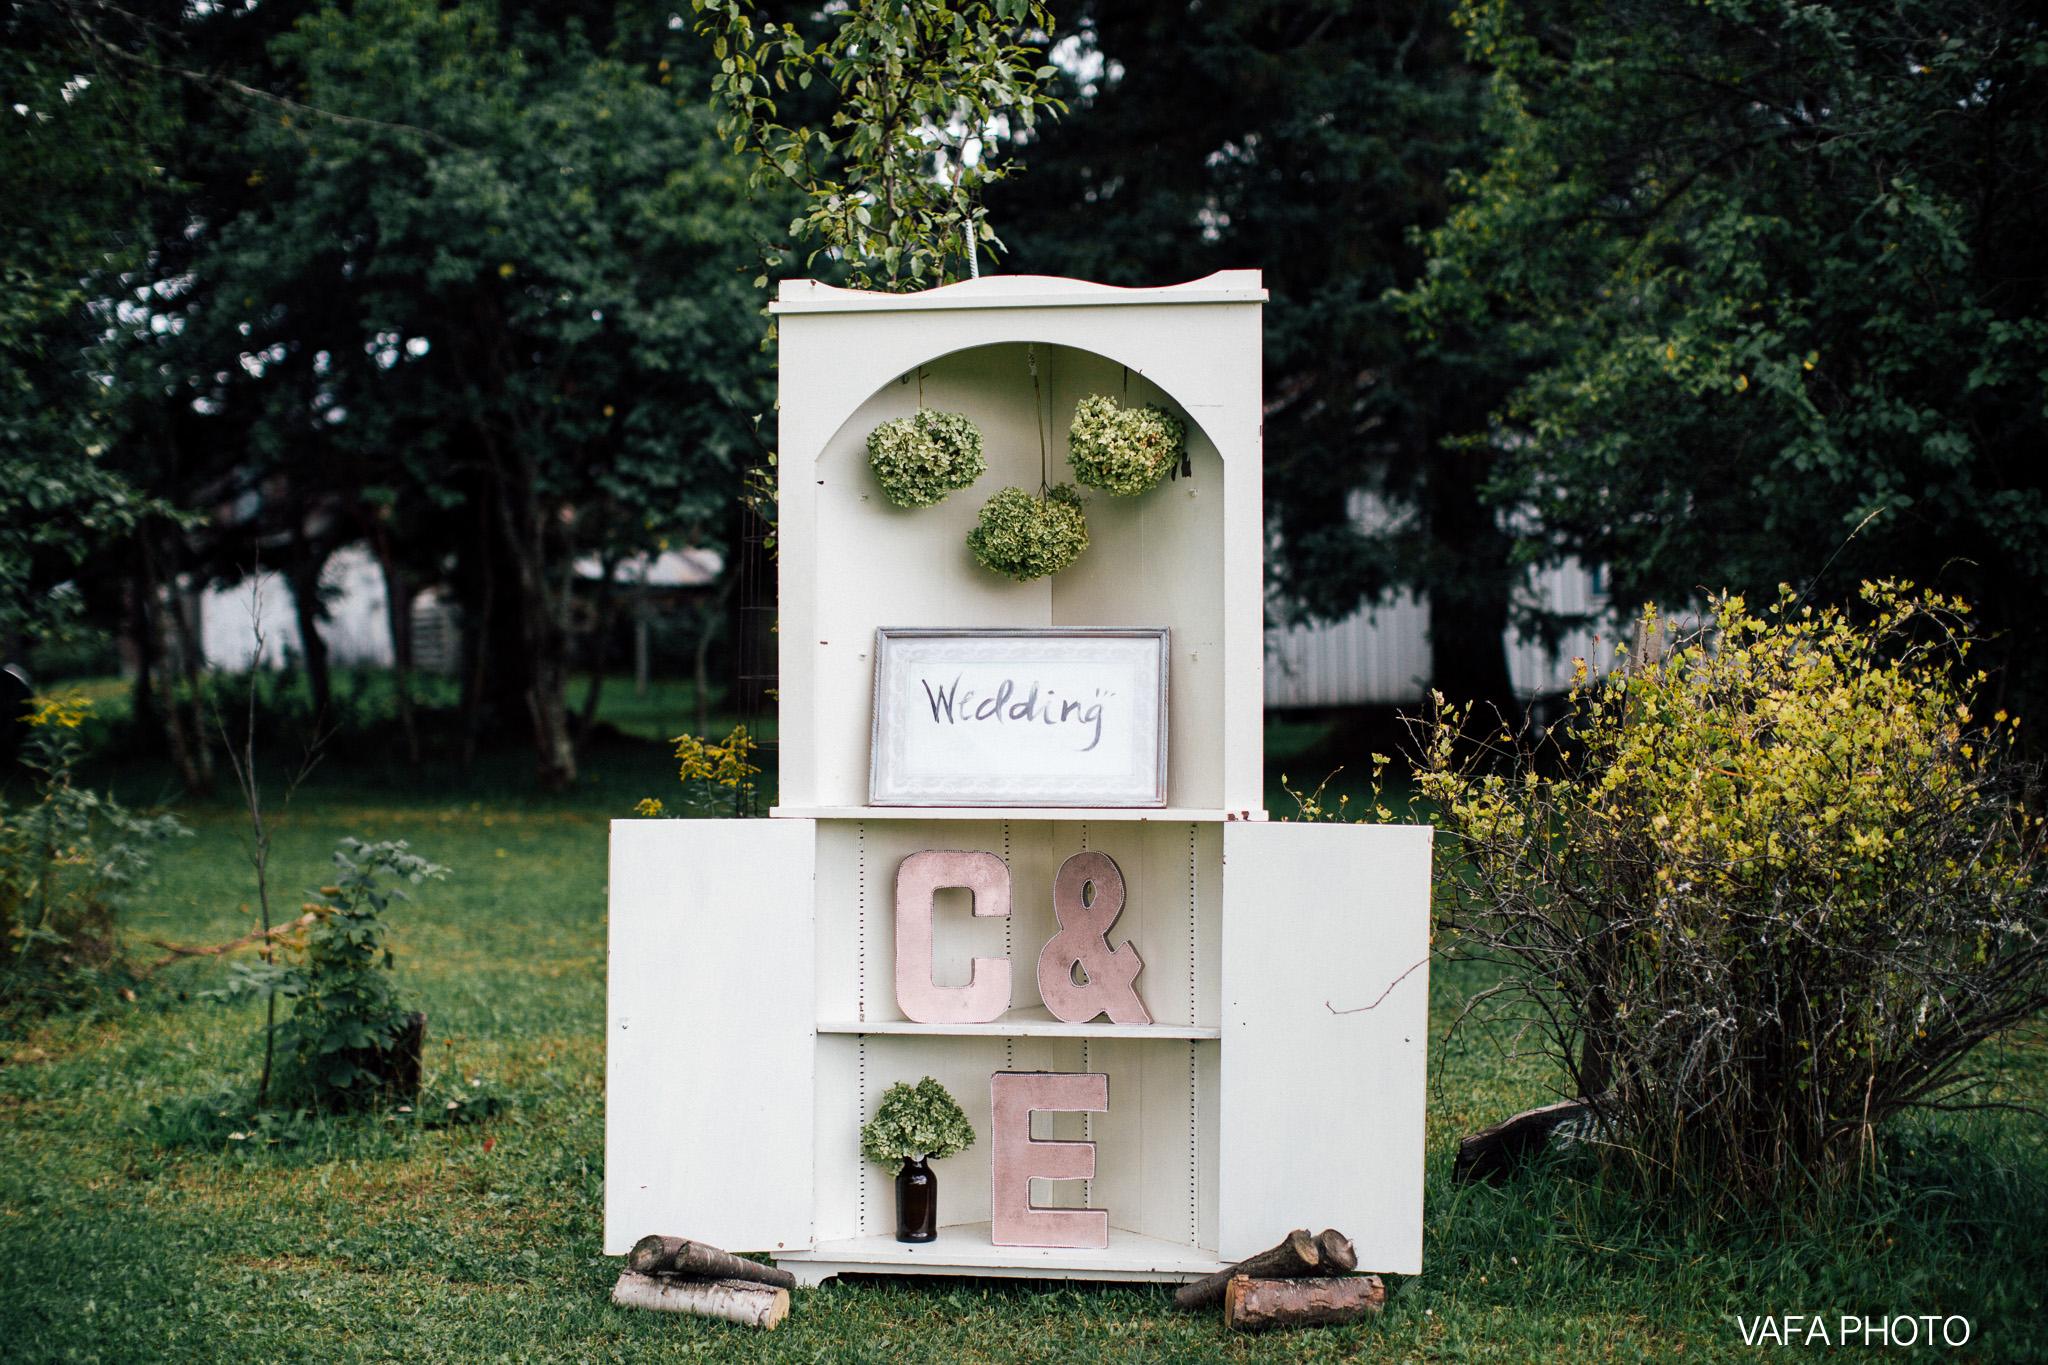 Belsolda-Farm-Wedding-Christy-Eric-Vafa-Photo-23.jpg